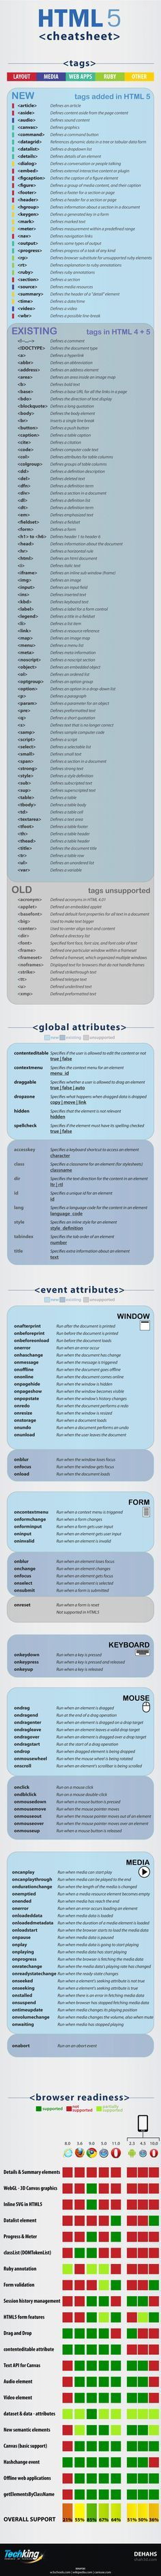 The Ultimate HTML 5 Cheat Sheet | Bit Rebels